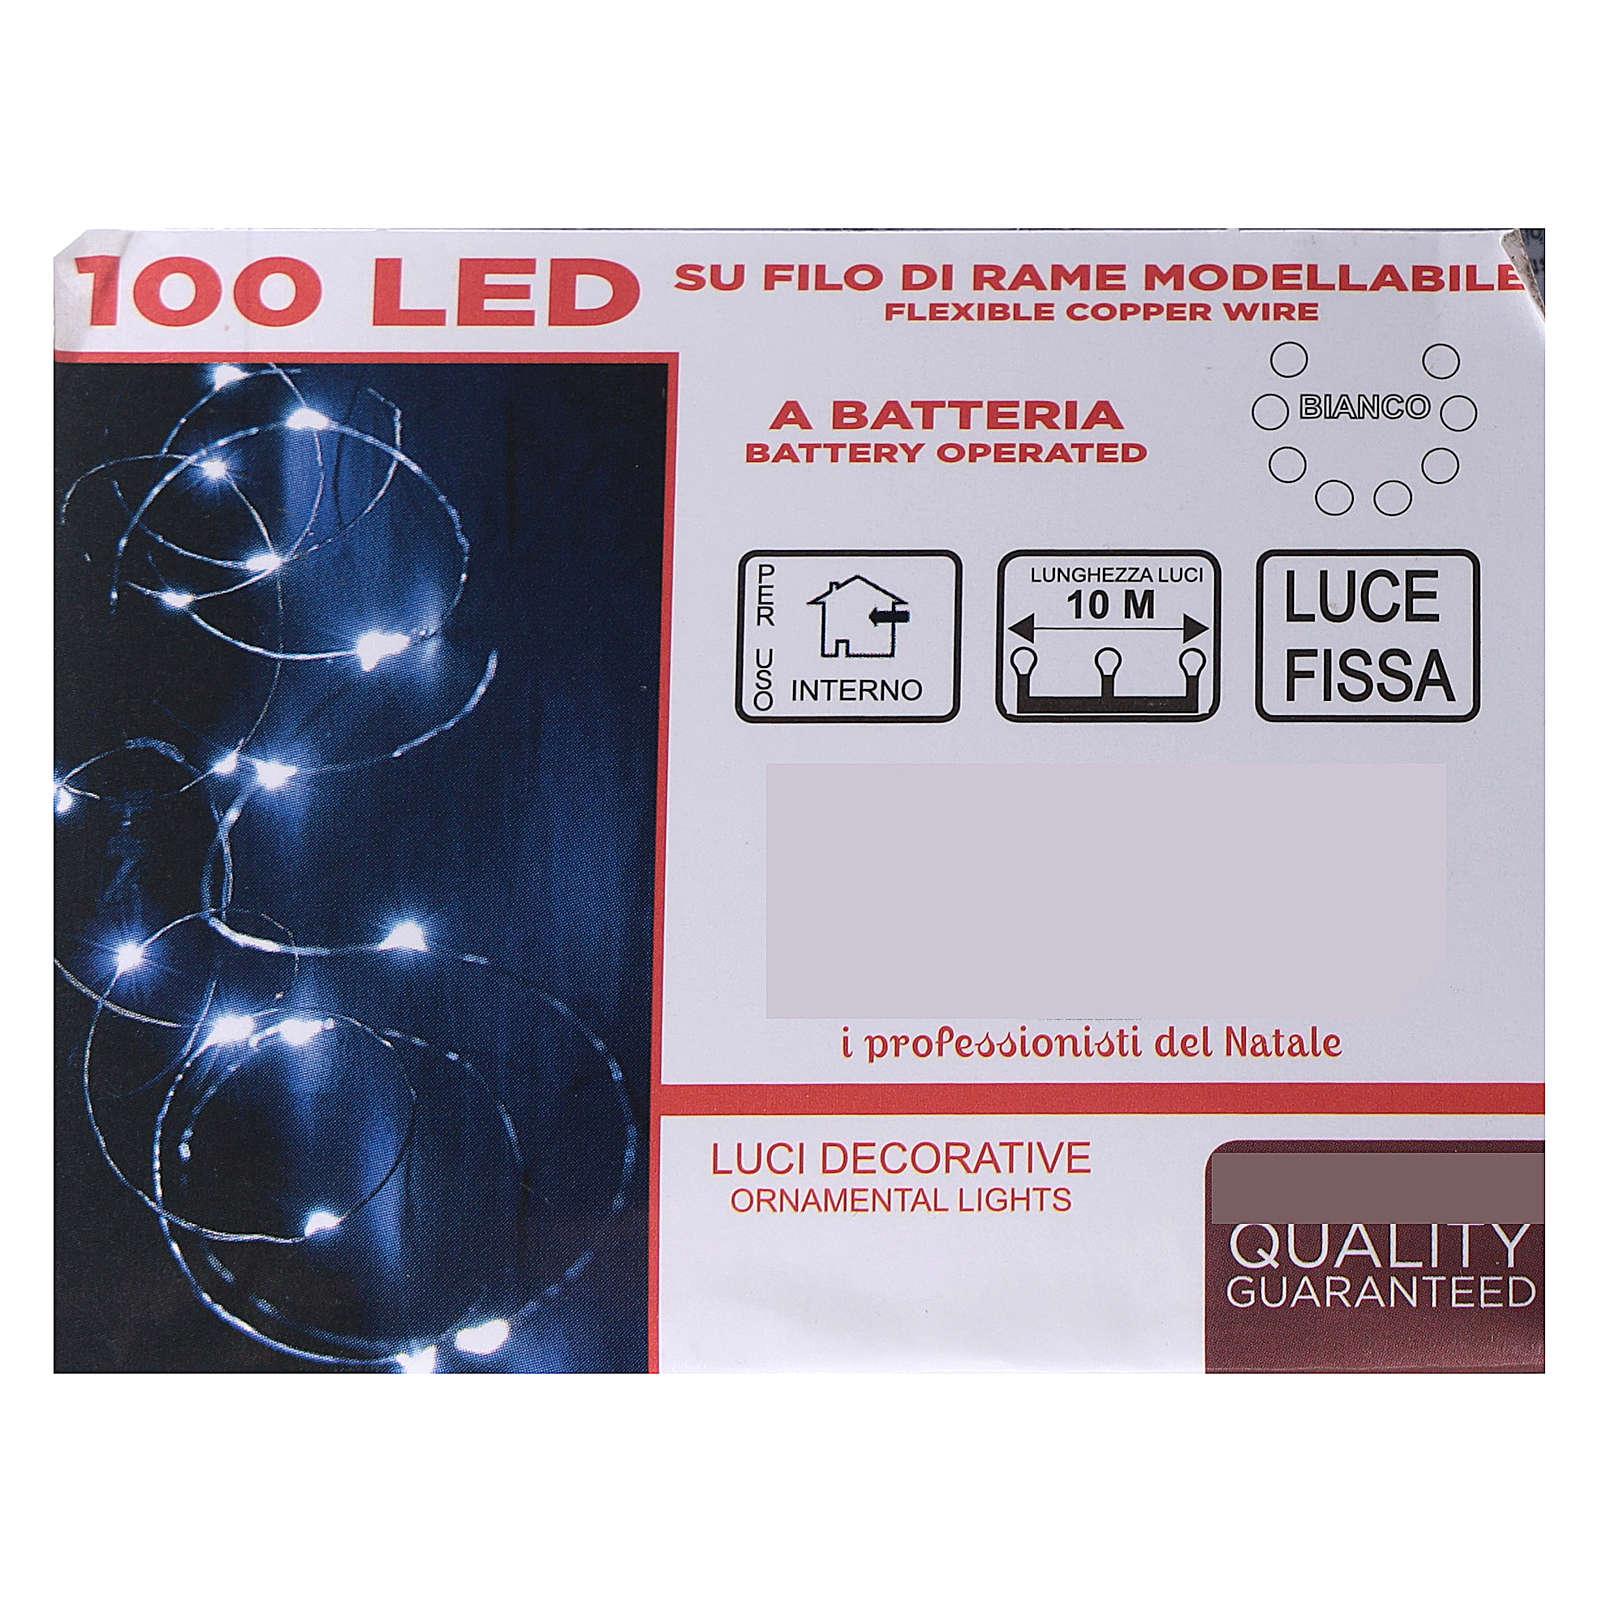 Cadena luminosa batería 10 m 100 gotas led blanco frío interior 3